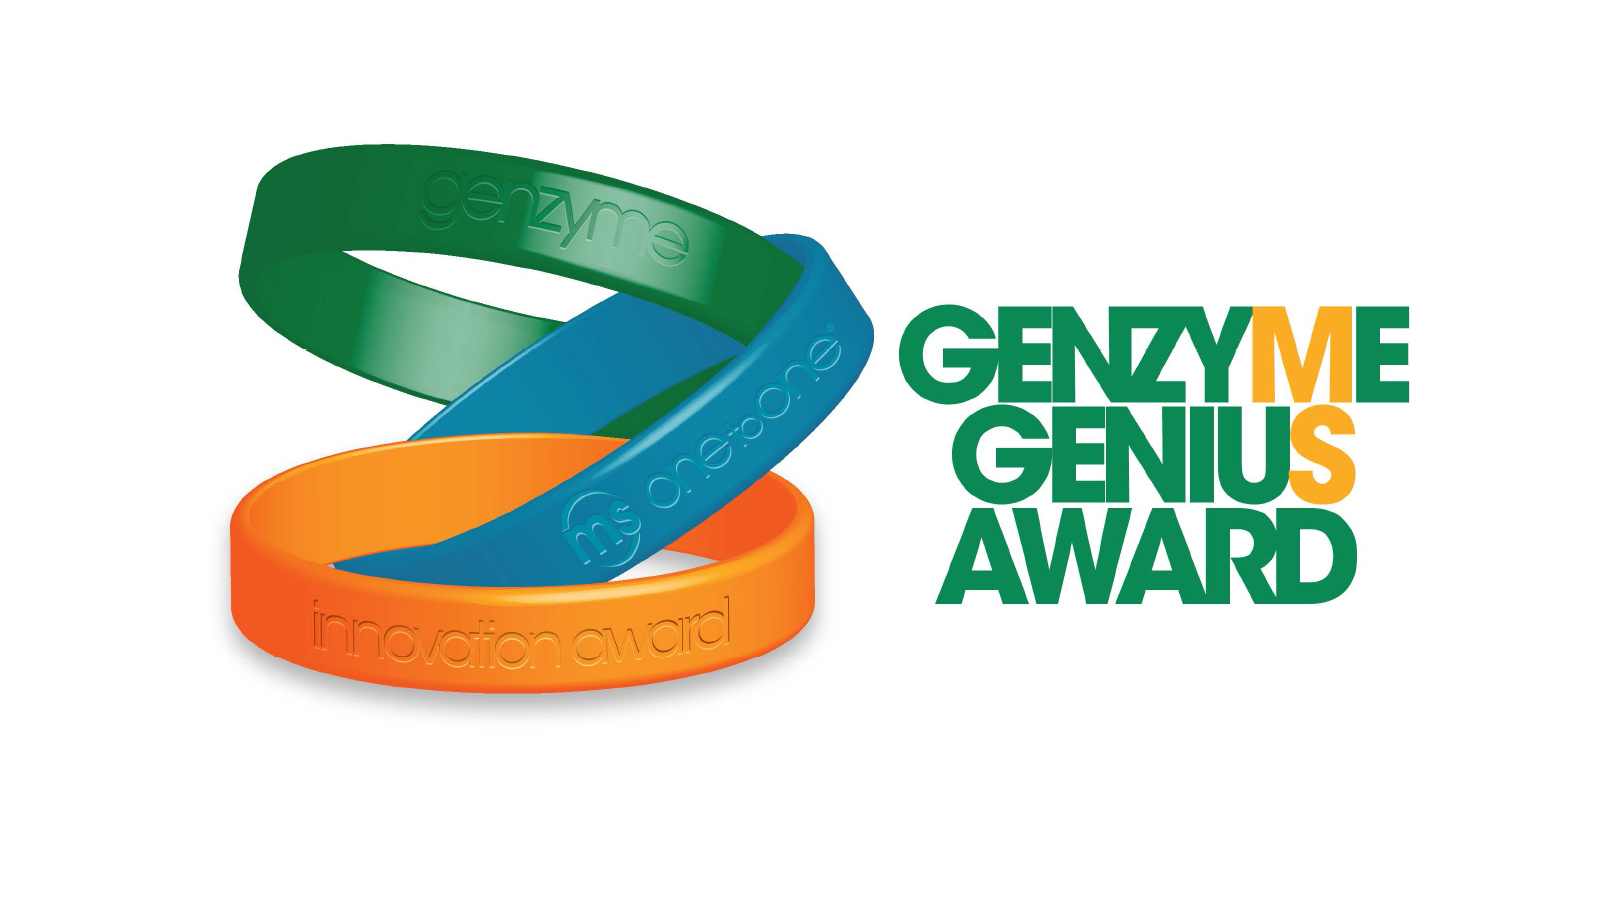 Genzyme Genius Award Bracelets Concept